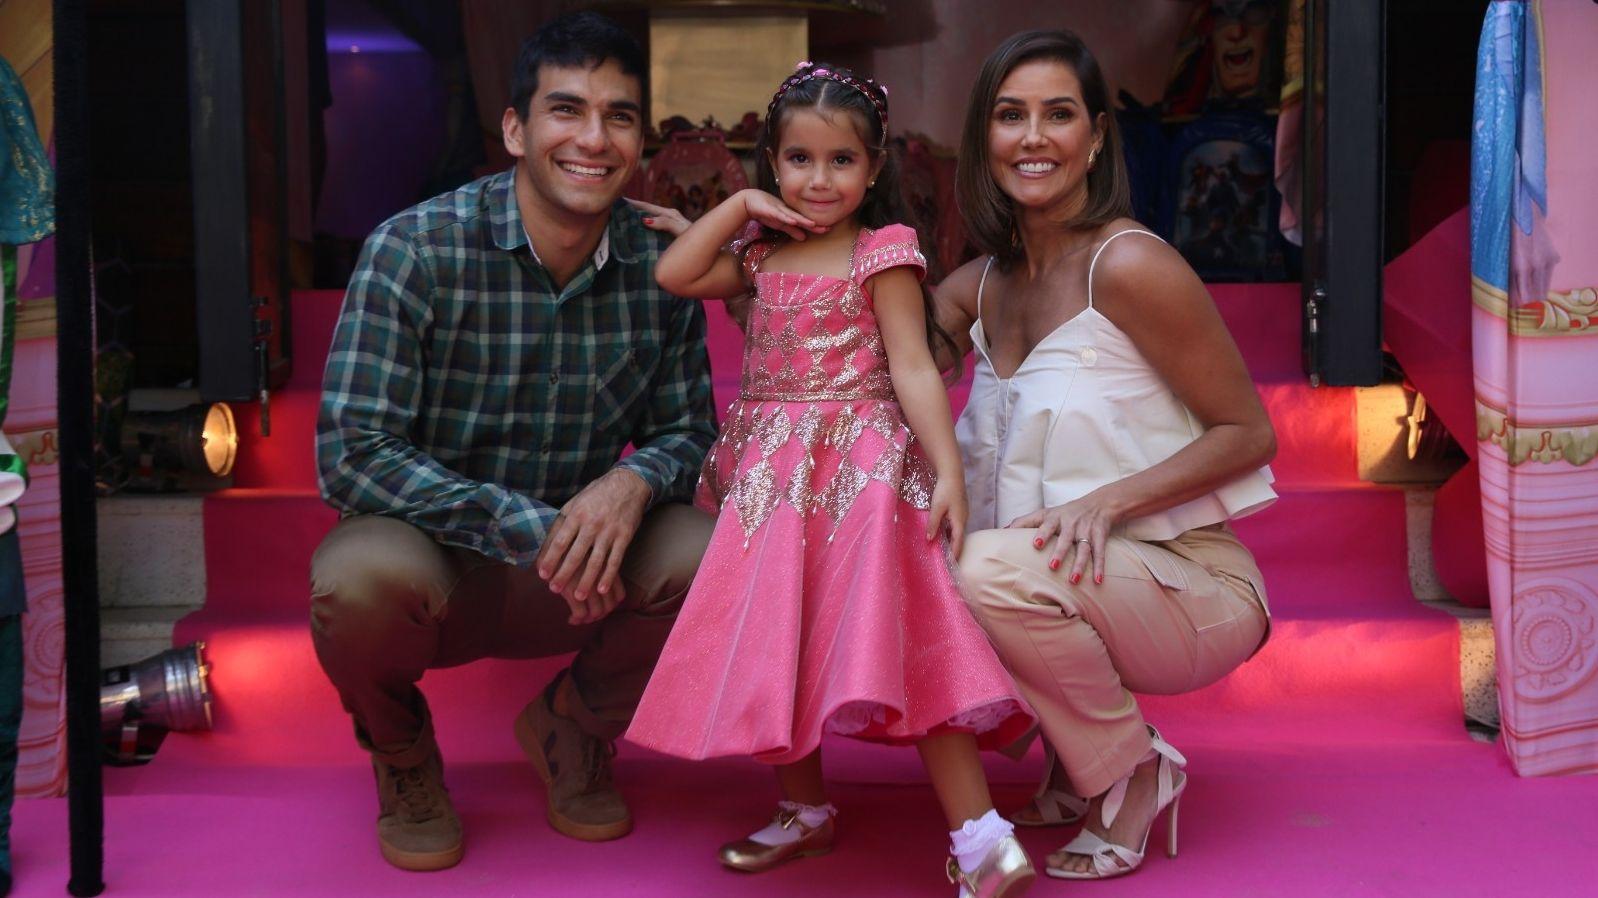 Deborah Secco Vai Montar Peca Para A Filha Estrear No Teatro Ela